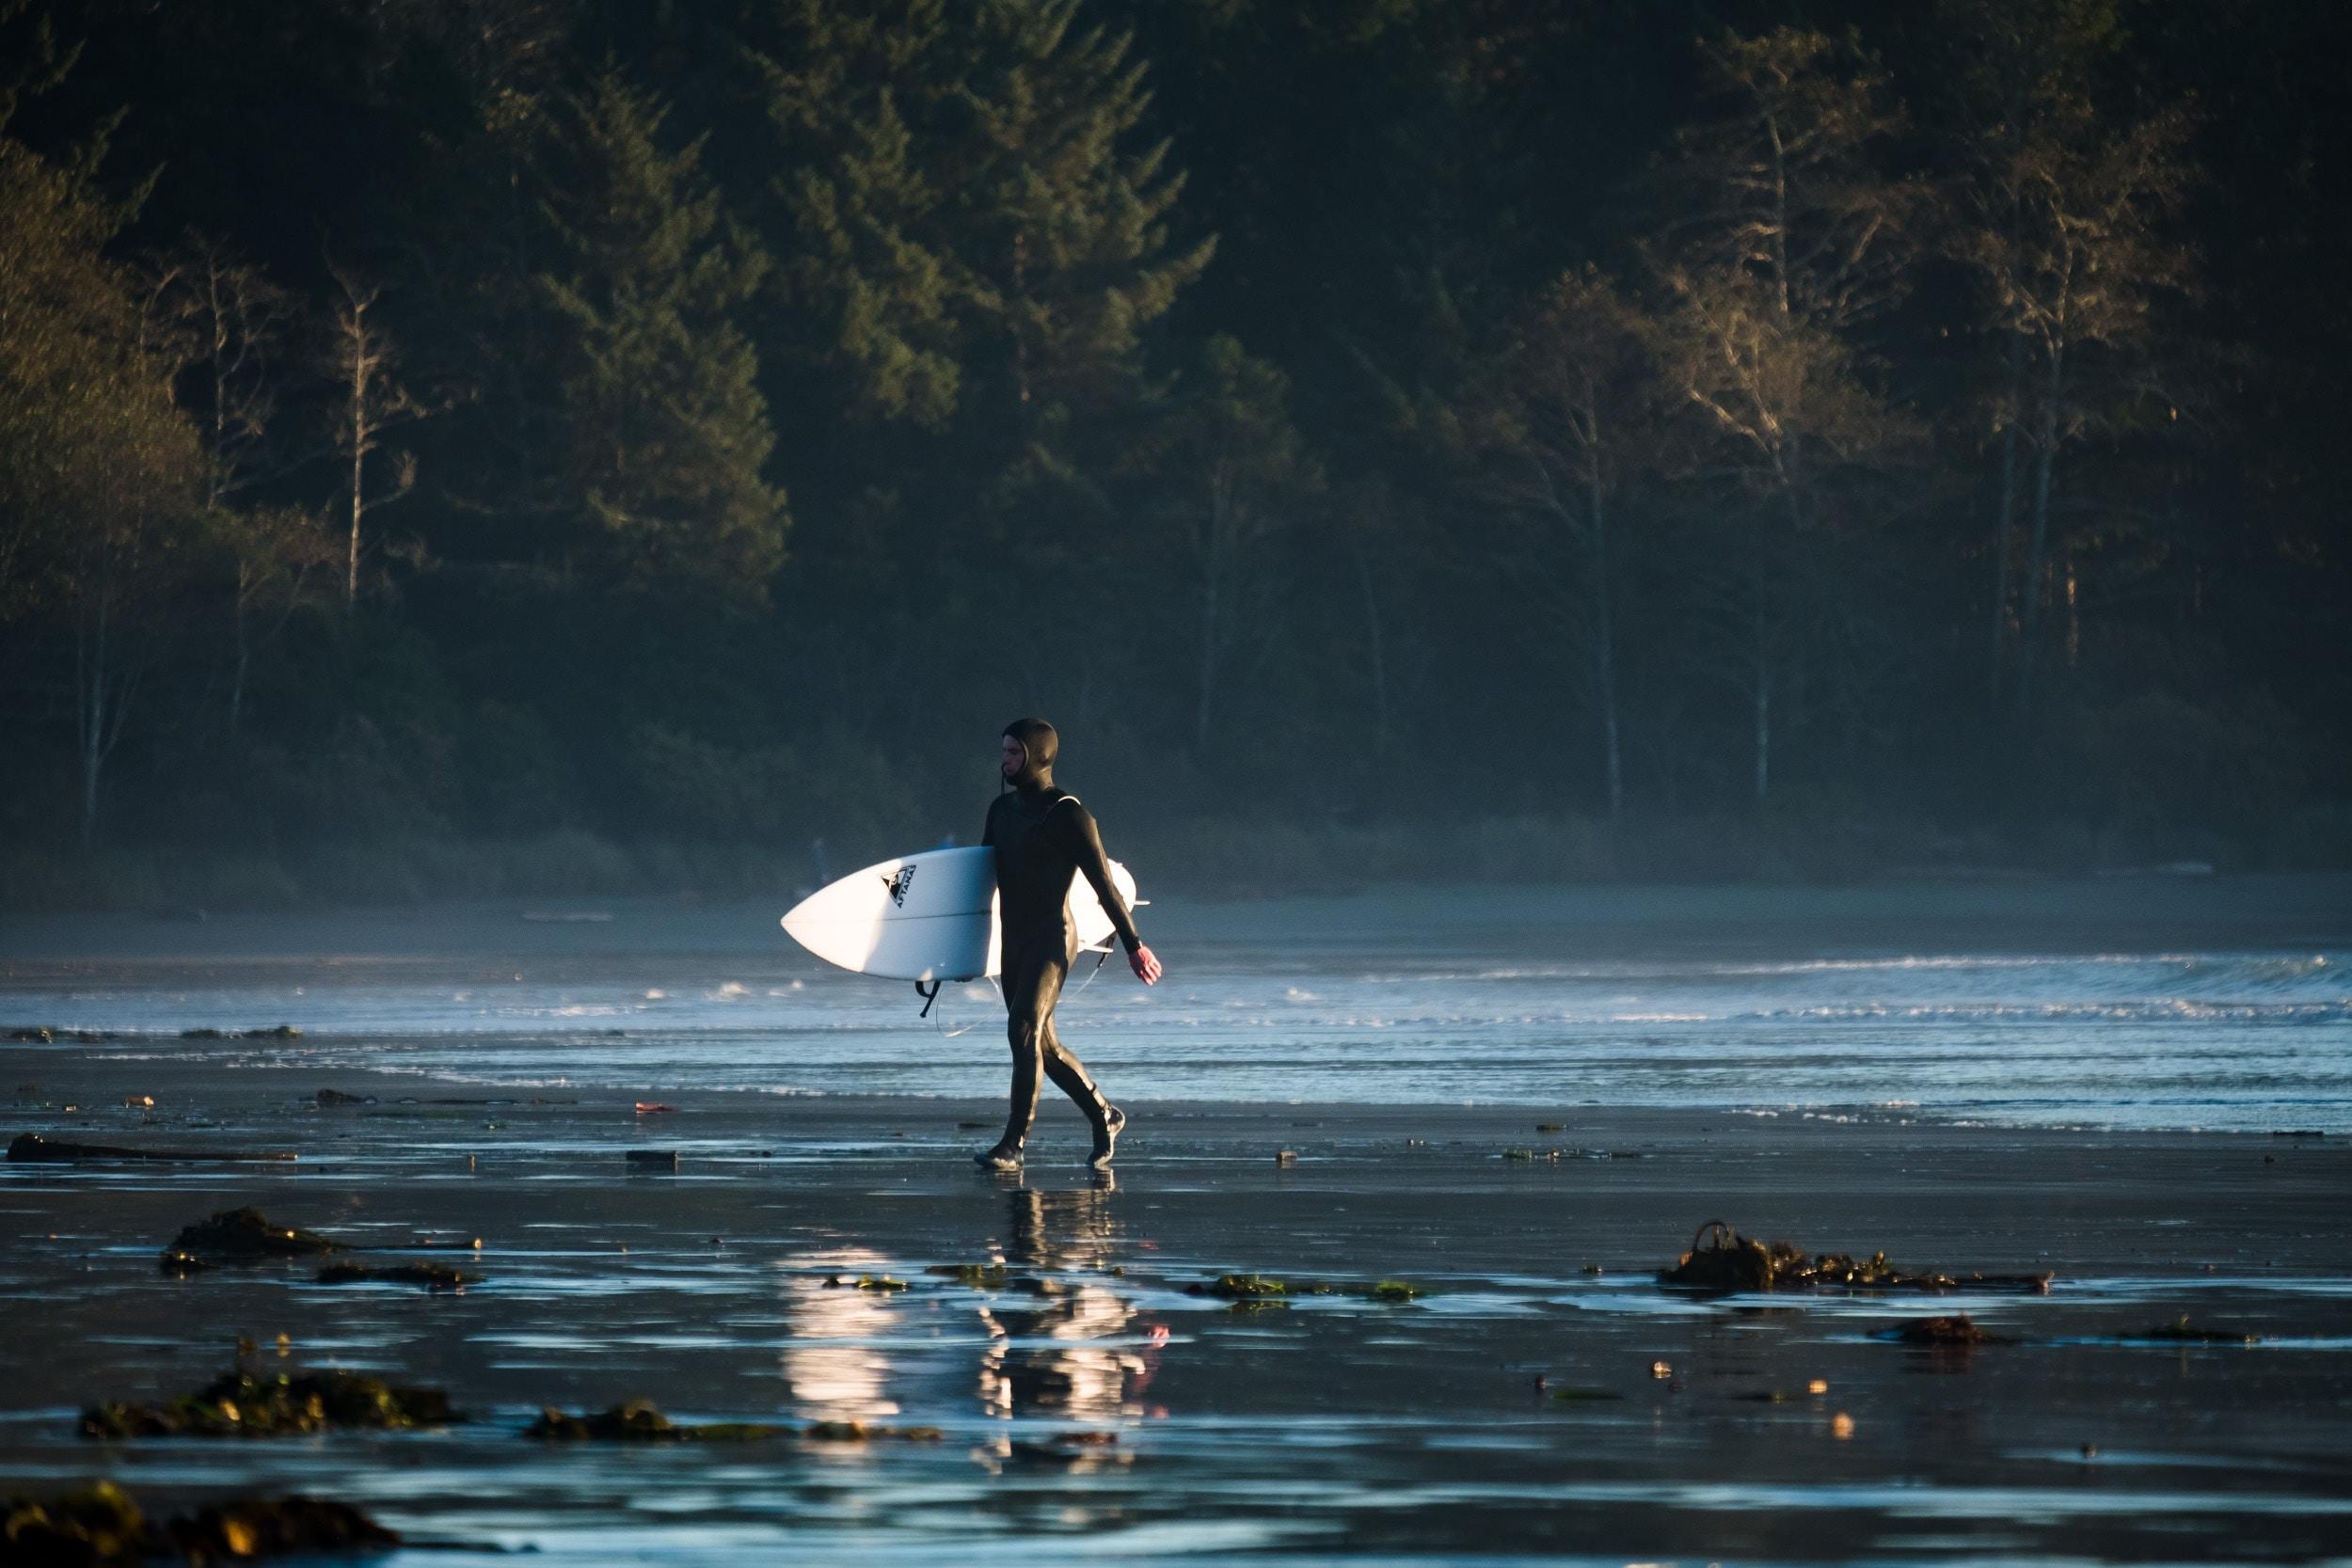 man carrying his white surfboard walking on seashore